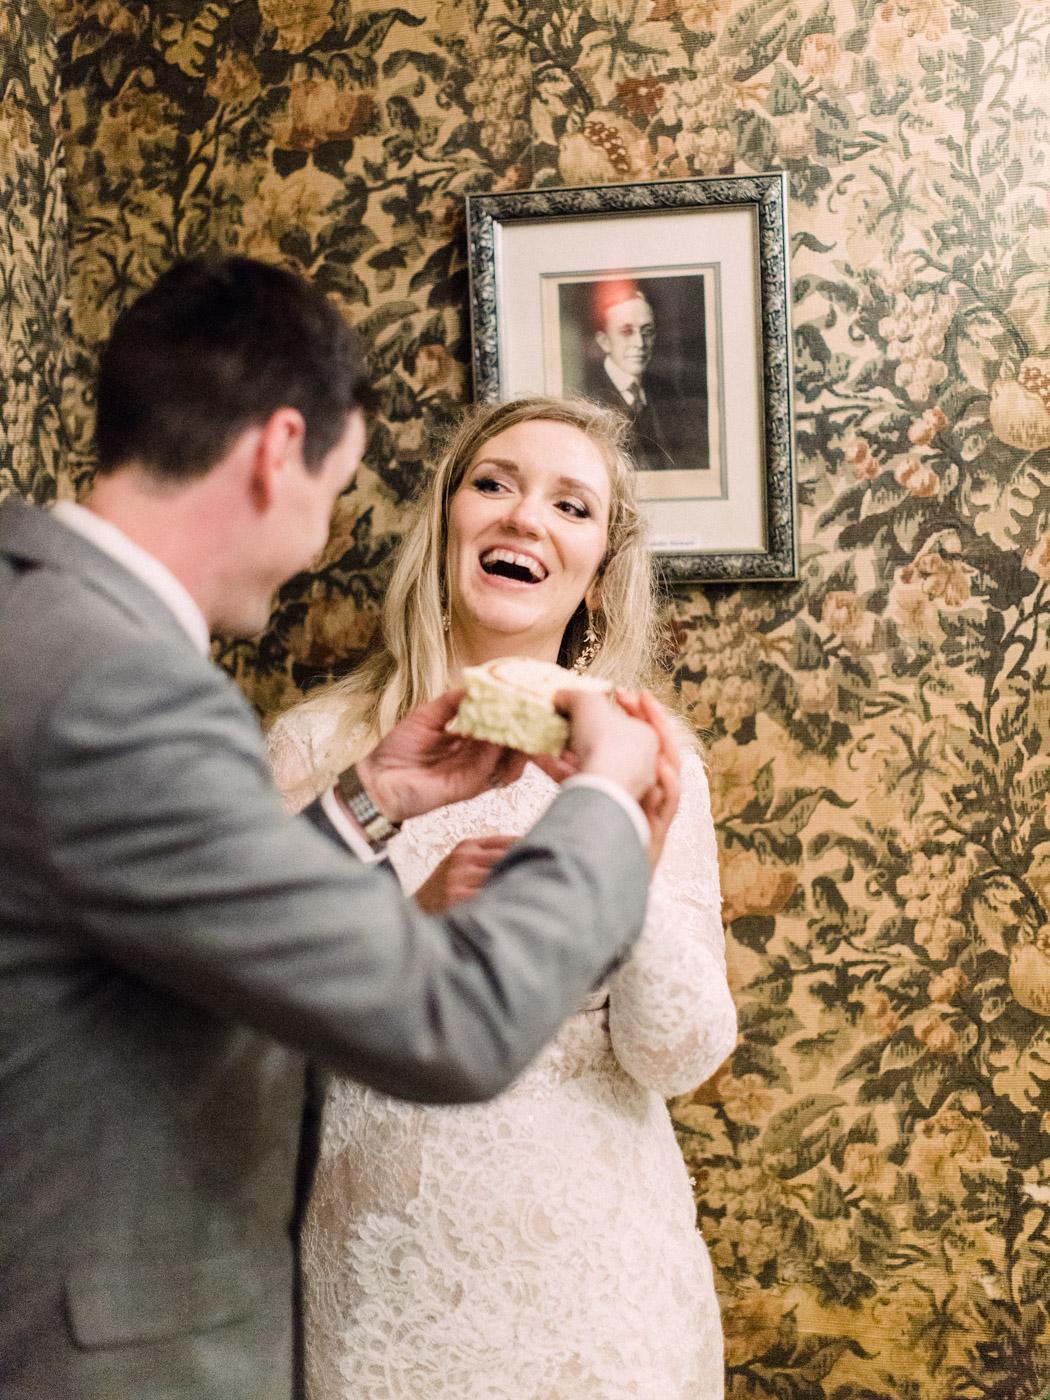 Toronto-wedding-photographer-intimate-classic-fine-art-elopement-ottawa102.jpg